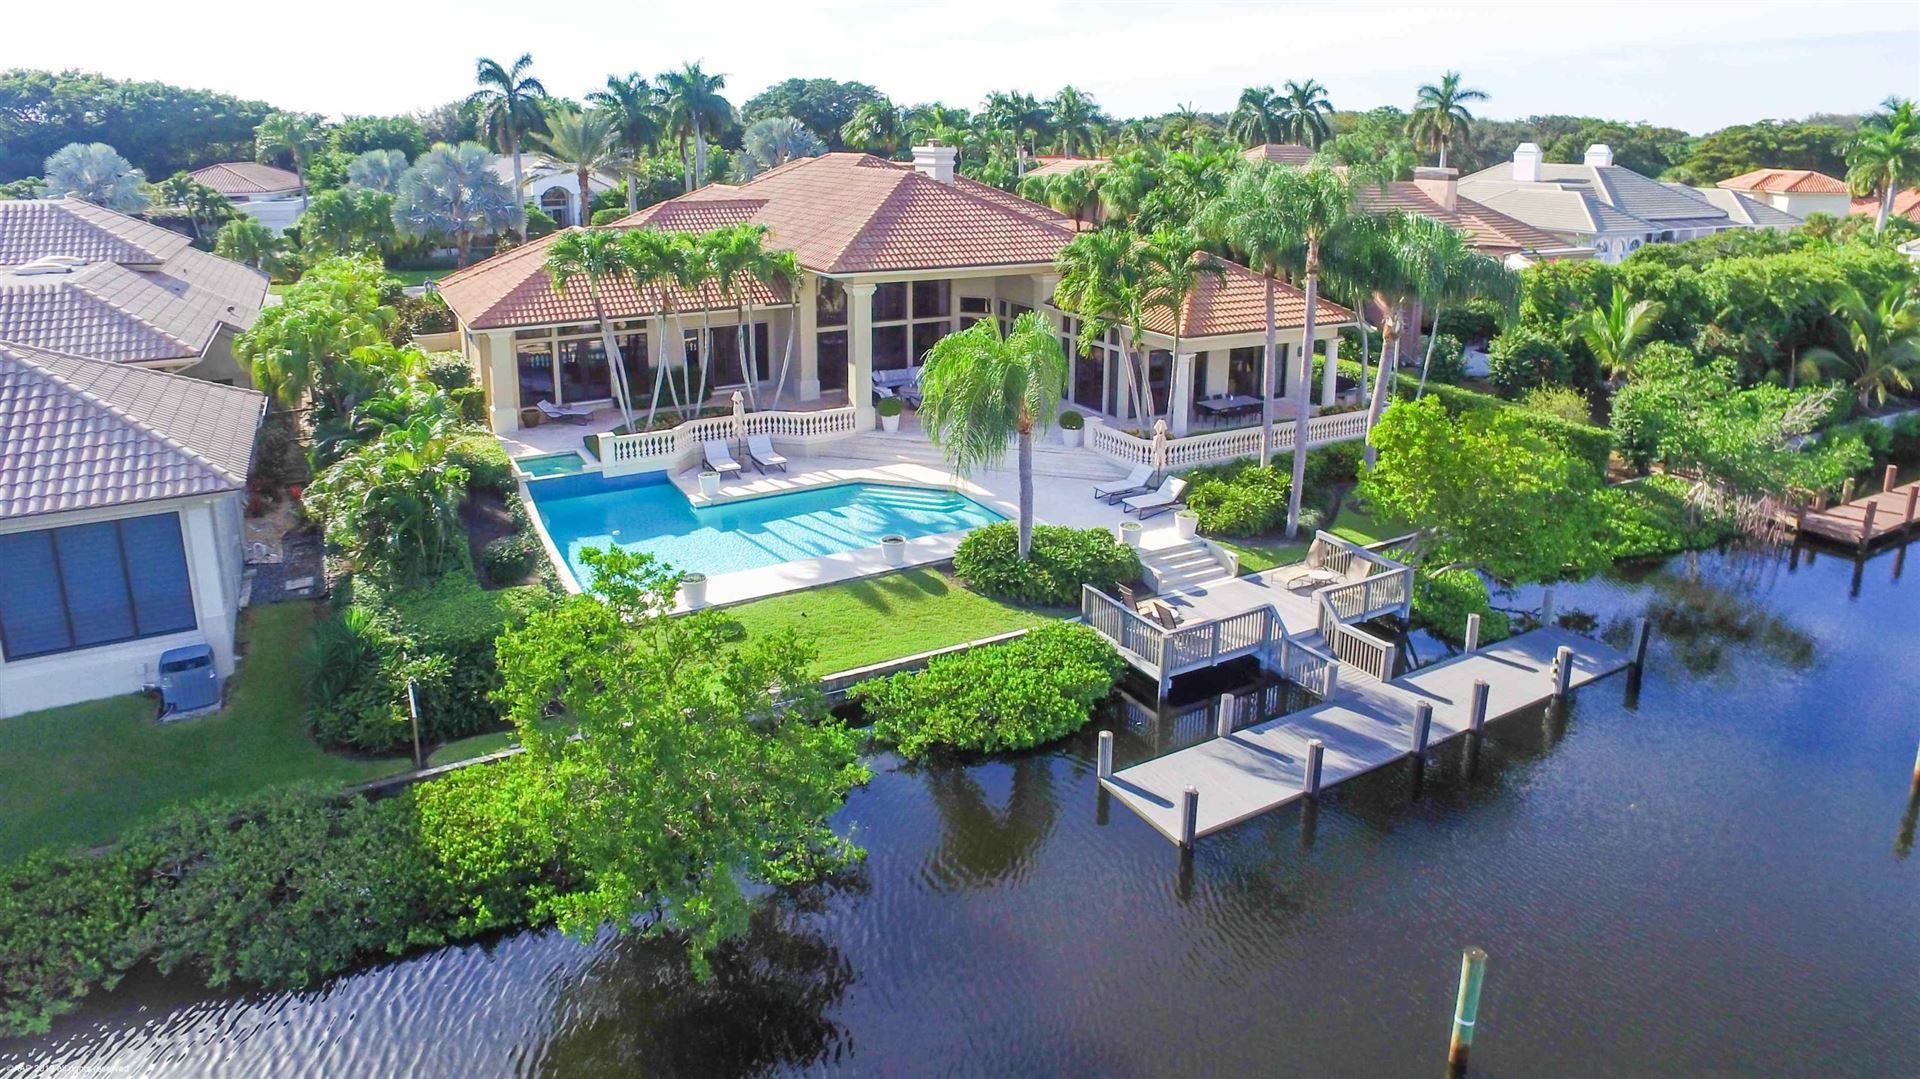 Photo of 13796 Le Bateau Lane, Palm Beach Gardens, FL 33410 (MLS # RX-10581759)